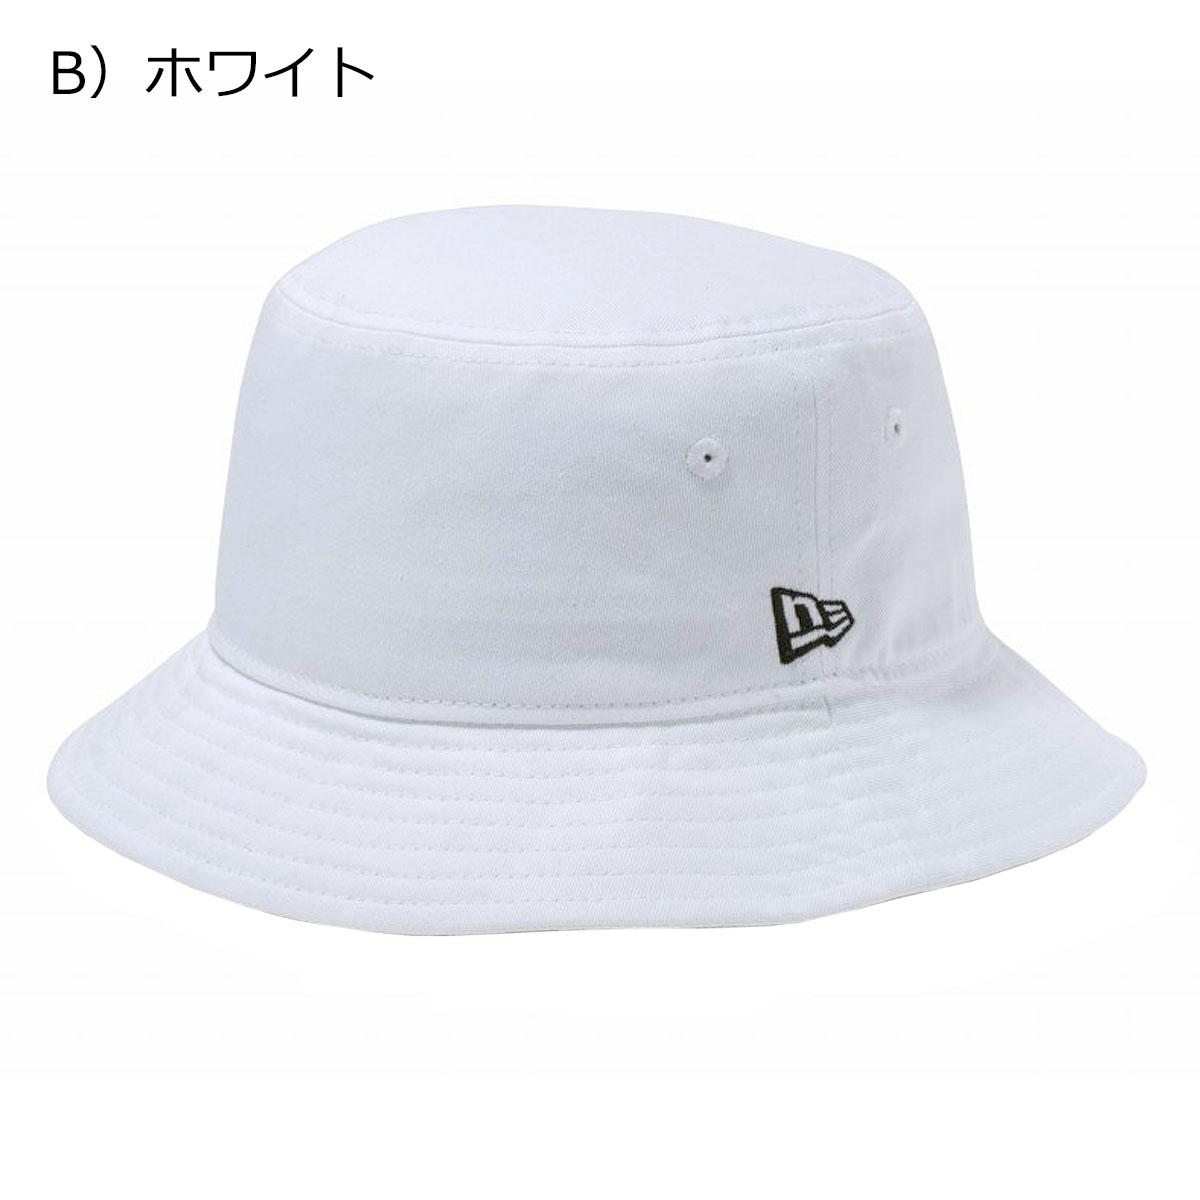 B)ホワイト